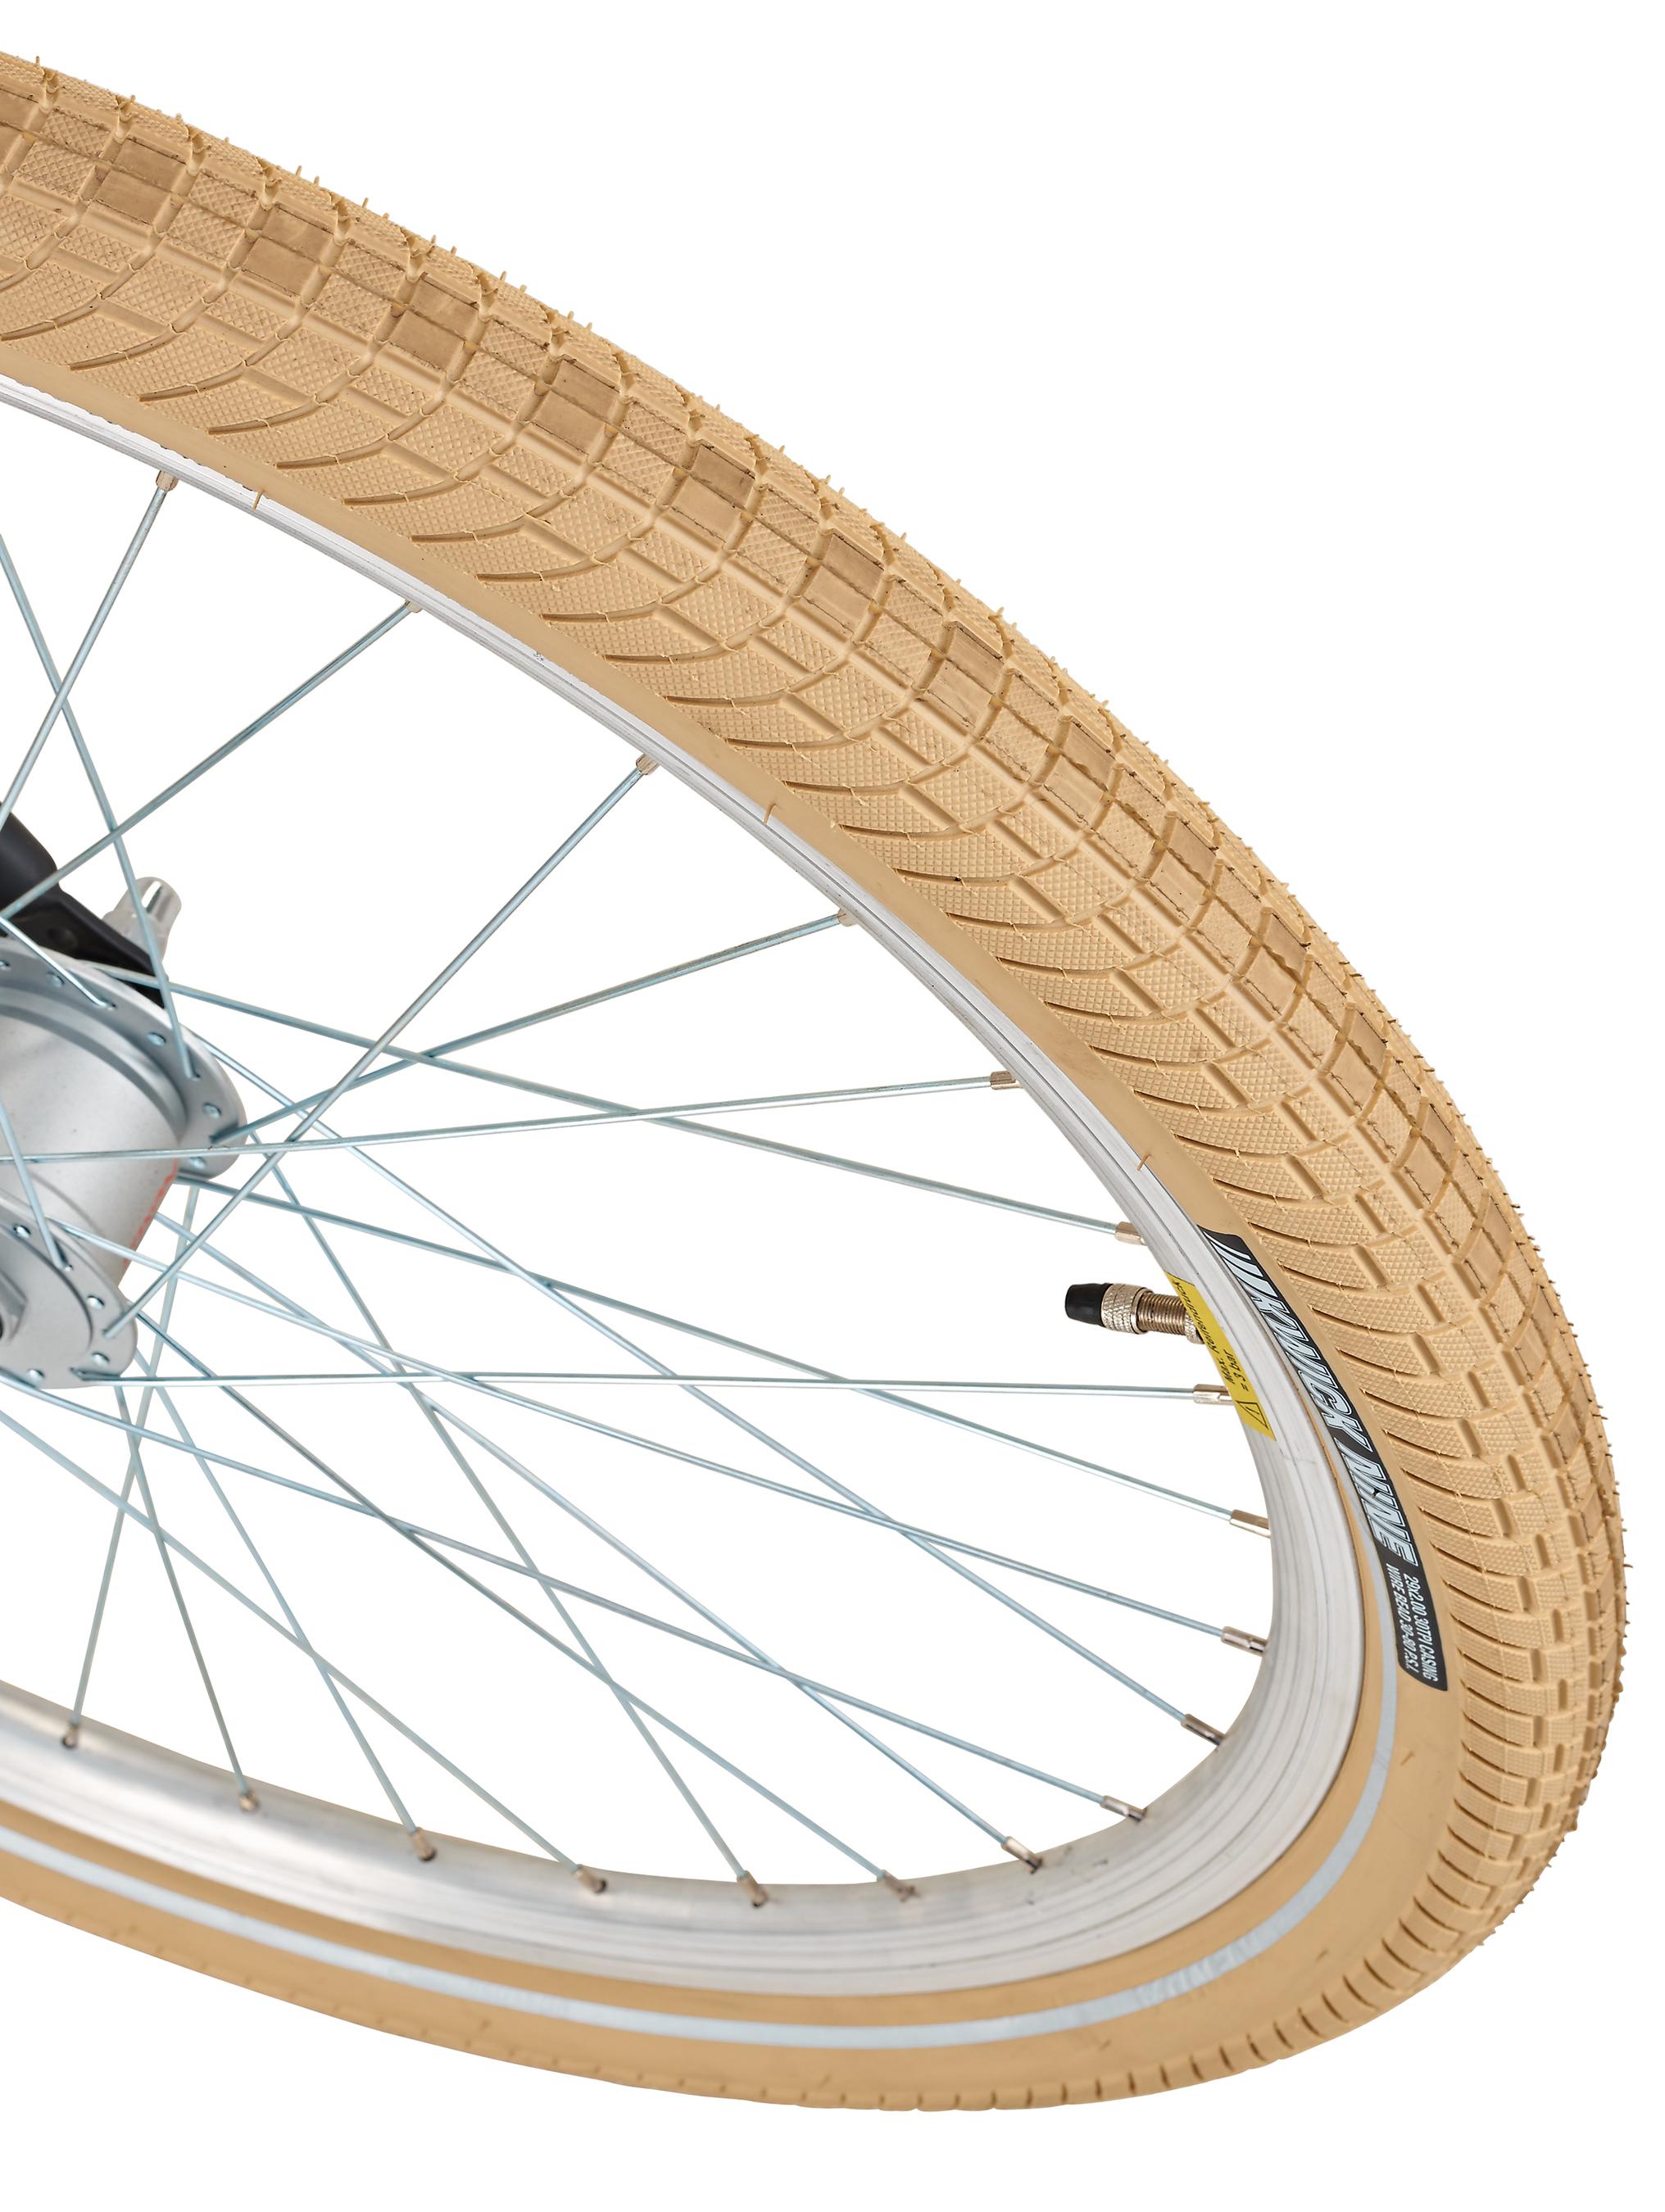 "Prophete Fahrrad / Cityrad Geniesser 9.2 City Bike 28"" Damen Bild 5"